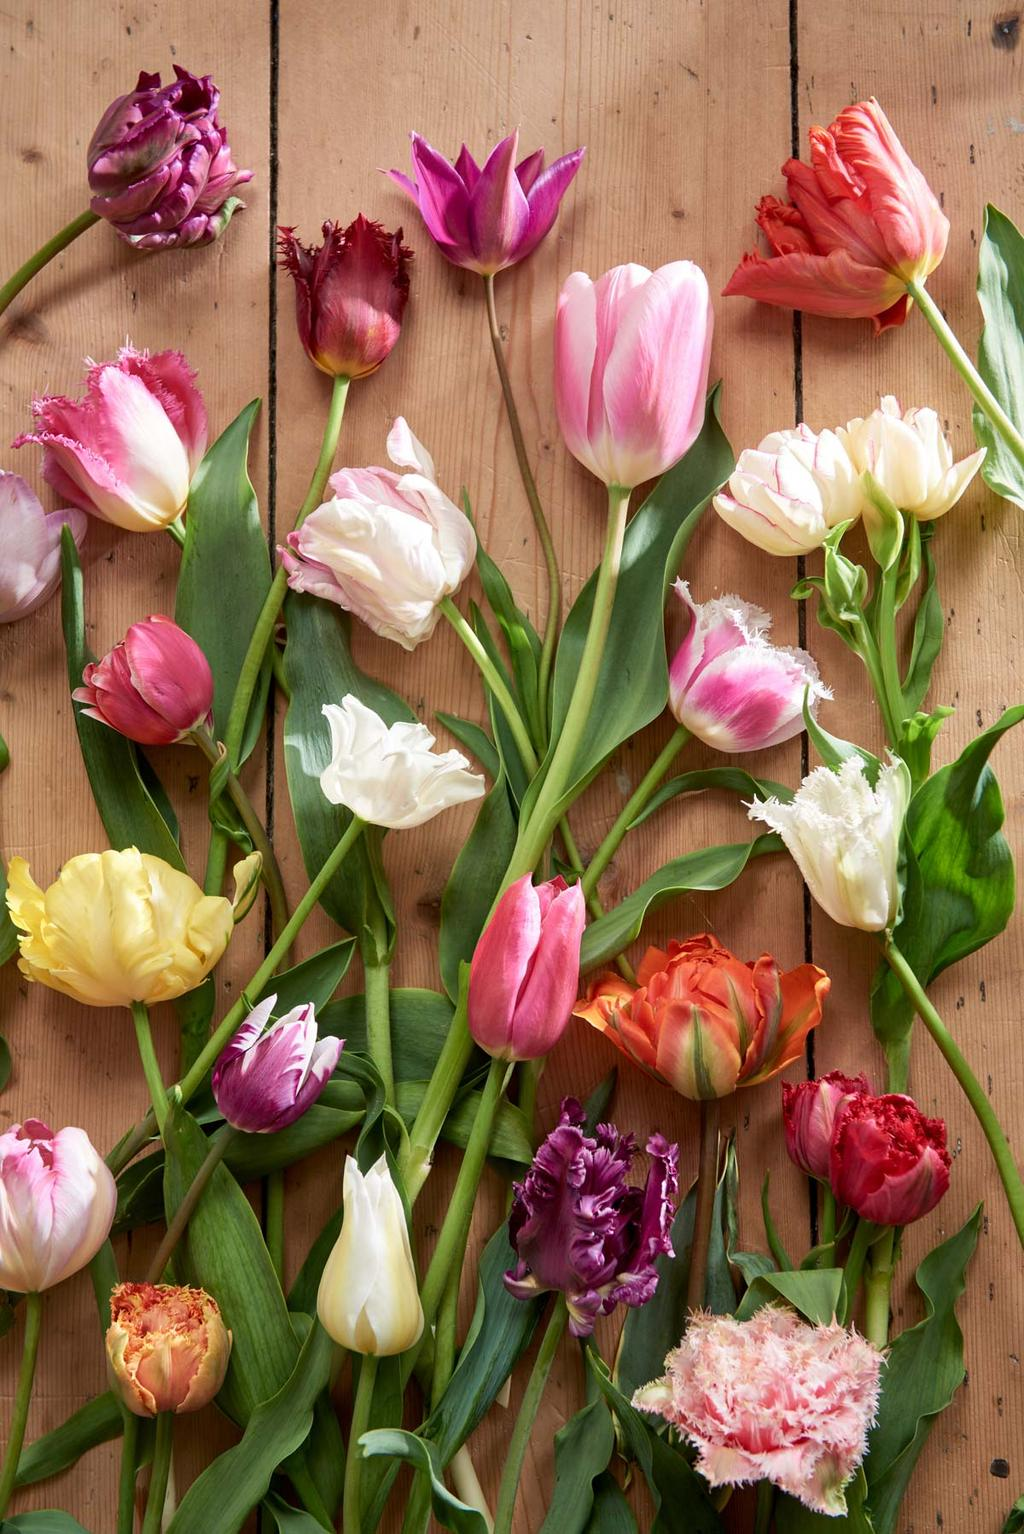 Gekleurde tulpen neergelegd op hout